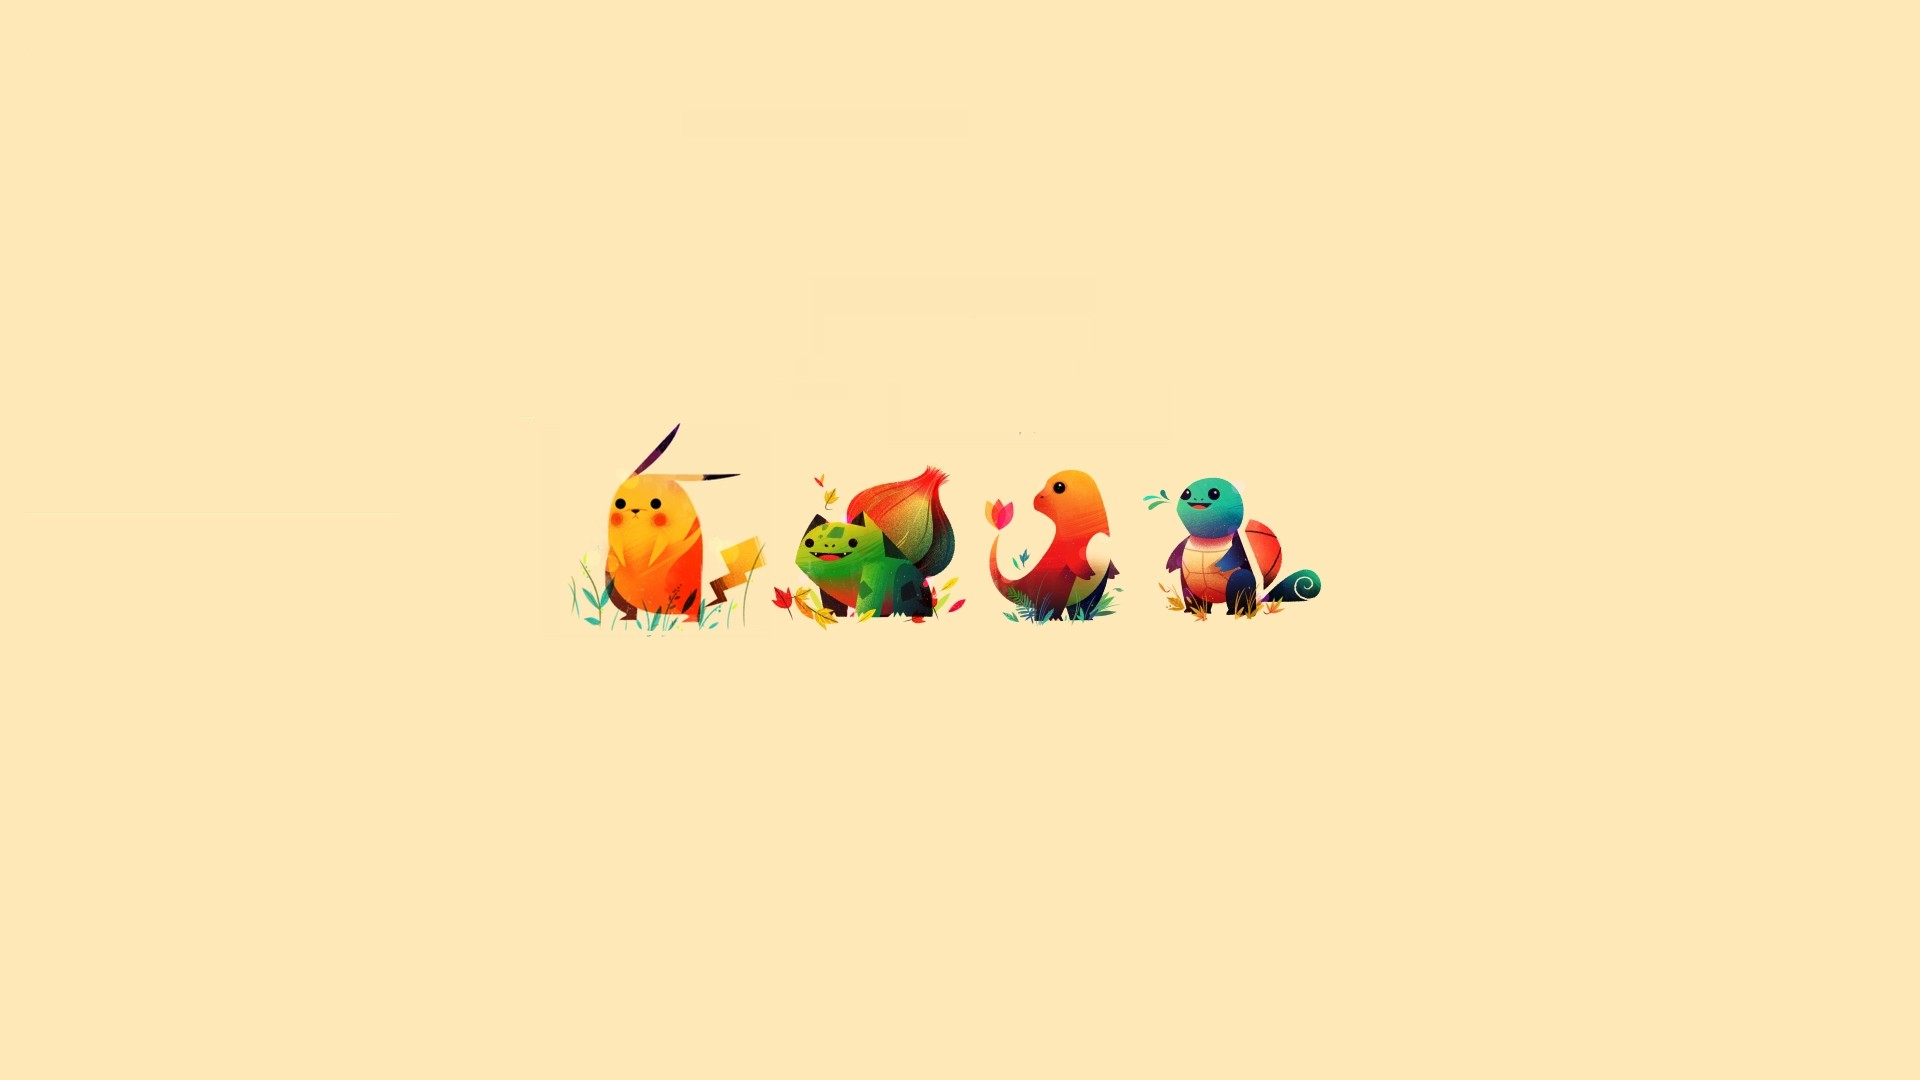 Pokemon minimalistic bulbasaur pikachu squirtle sepia backgrounds  charmander starter wallpaper